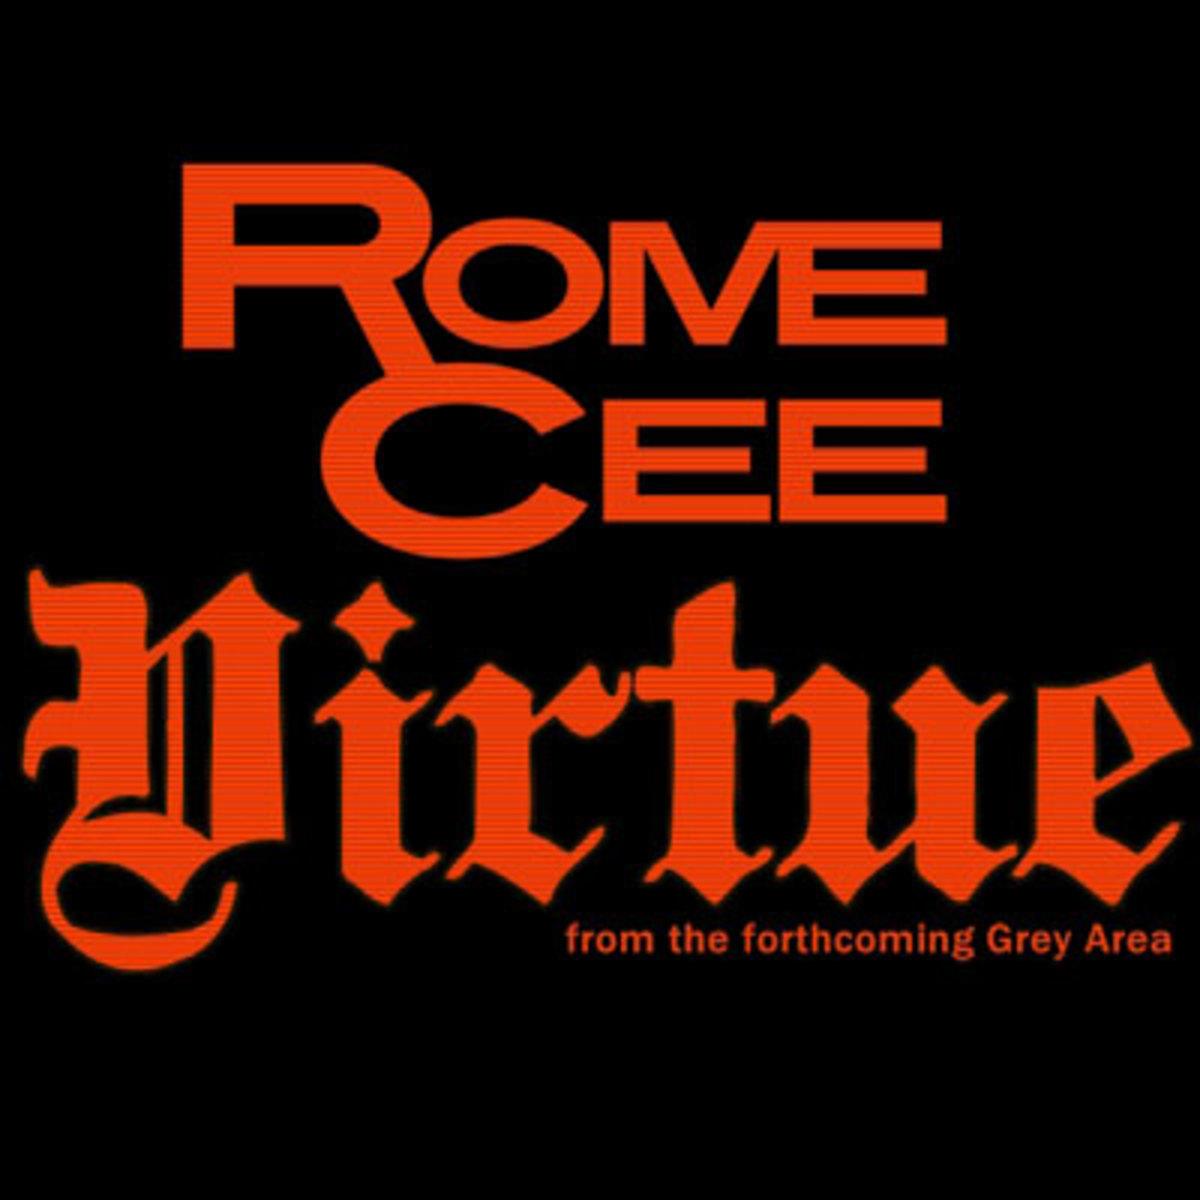 romecee-virtue.jpg